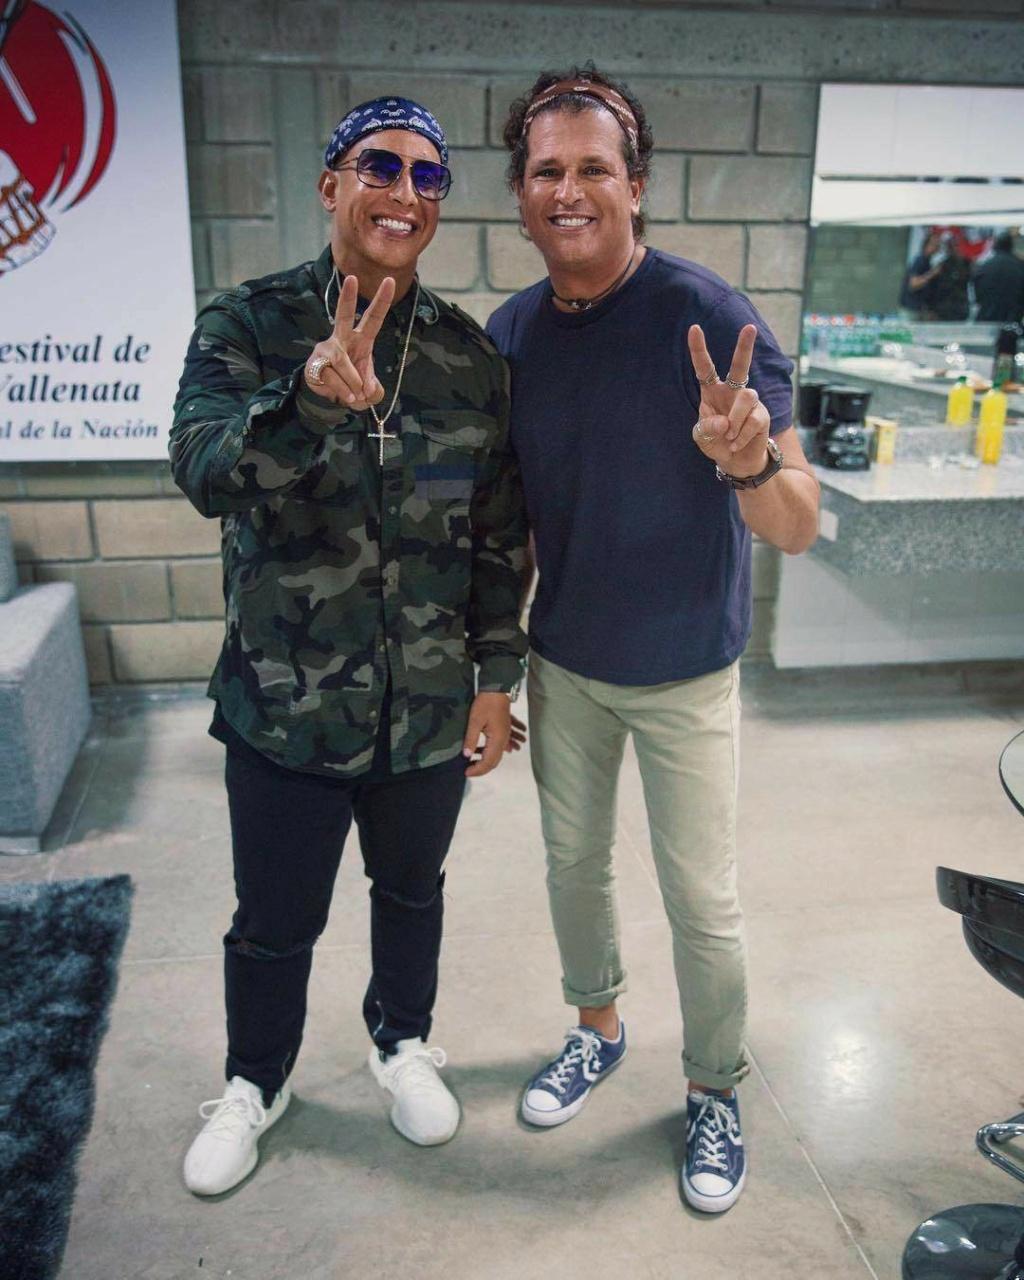 ¿Cuánto mide Daddy Yankee? - Altura - Real height - Página 2 Daddy-10